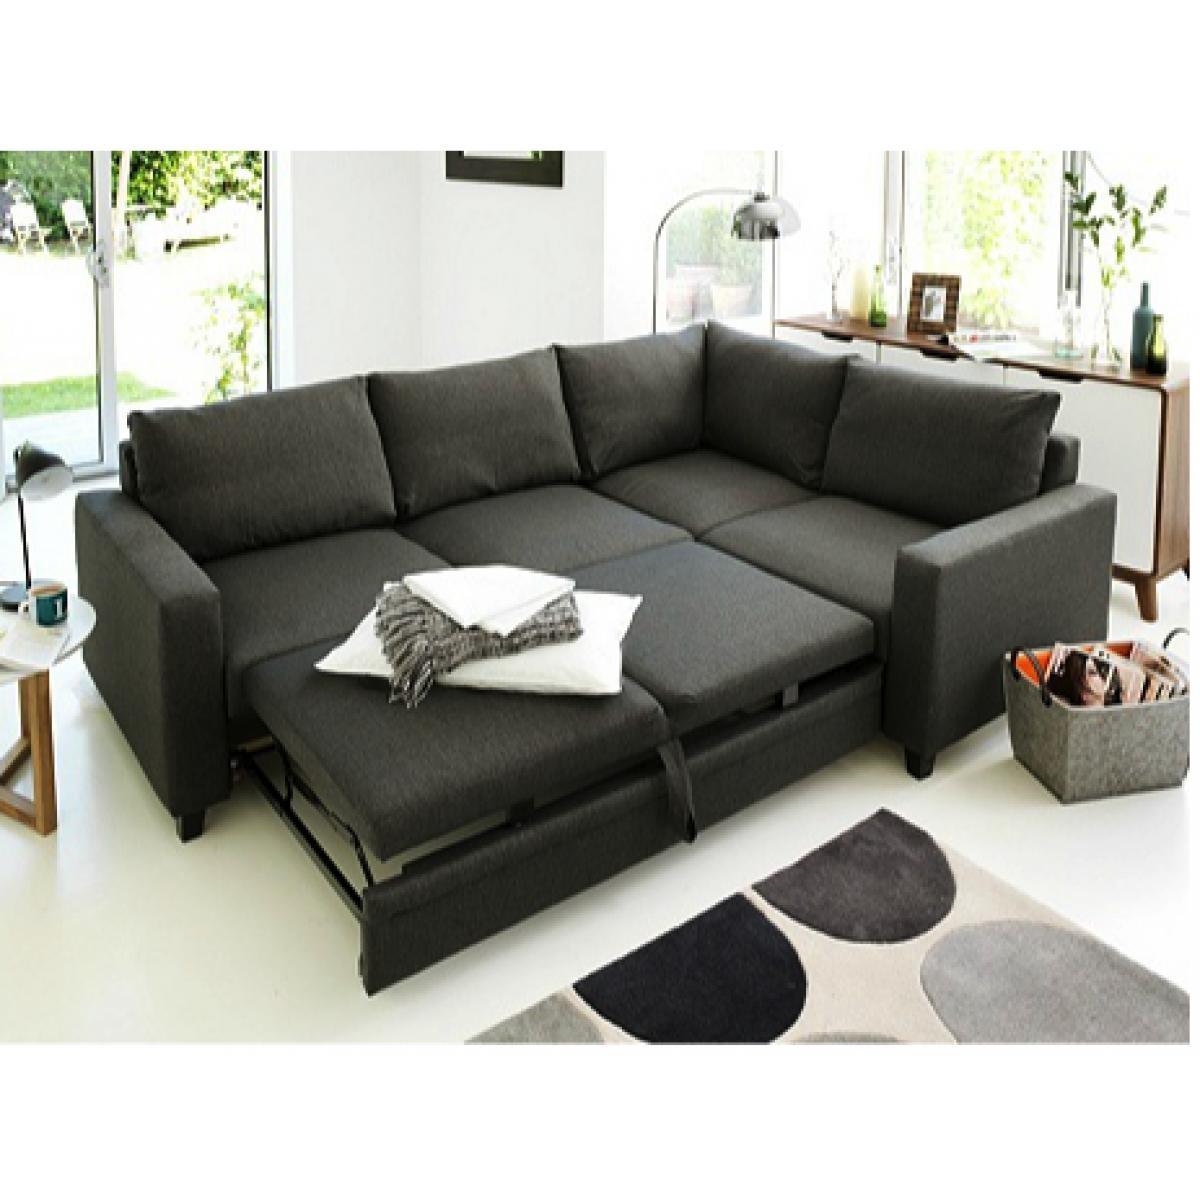 Jardan Sofa Bed - Leather Sectional Sofa regarding Cheap Corner Sofa Bed